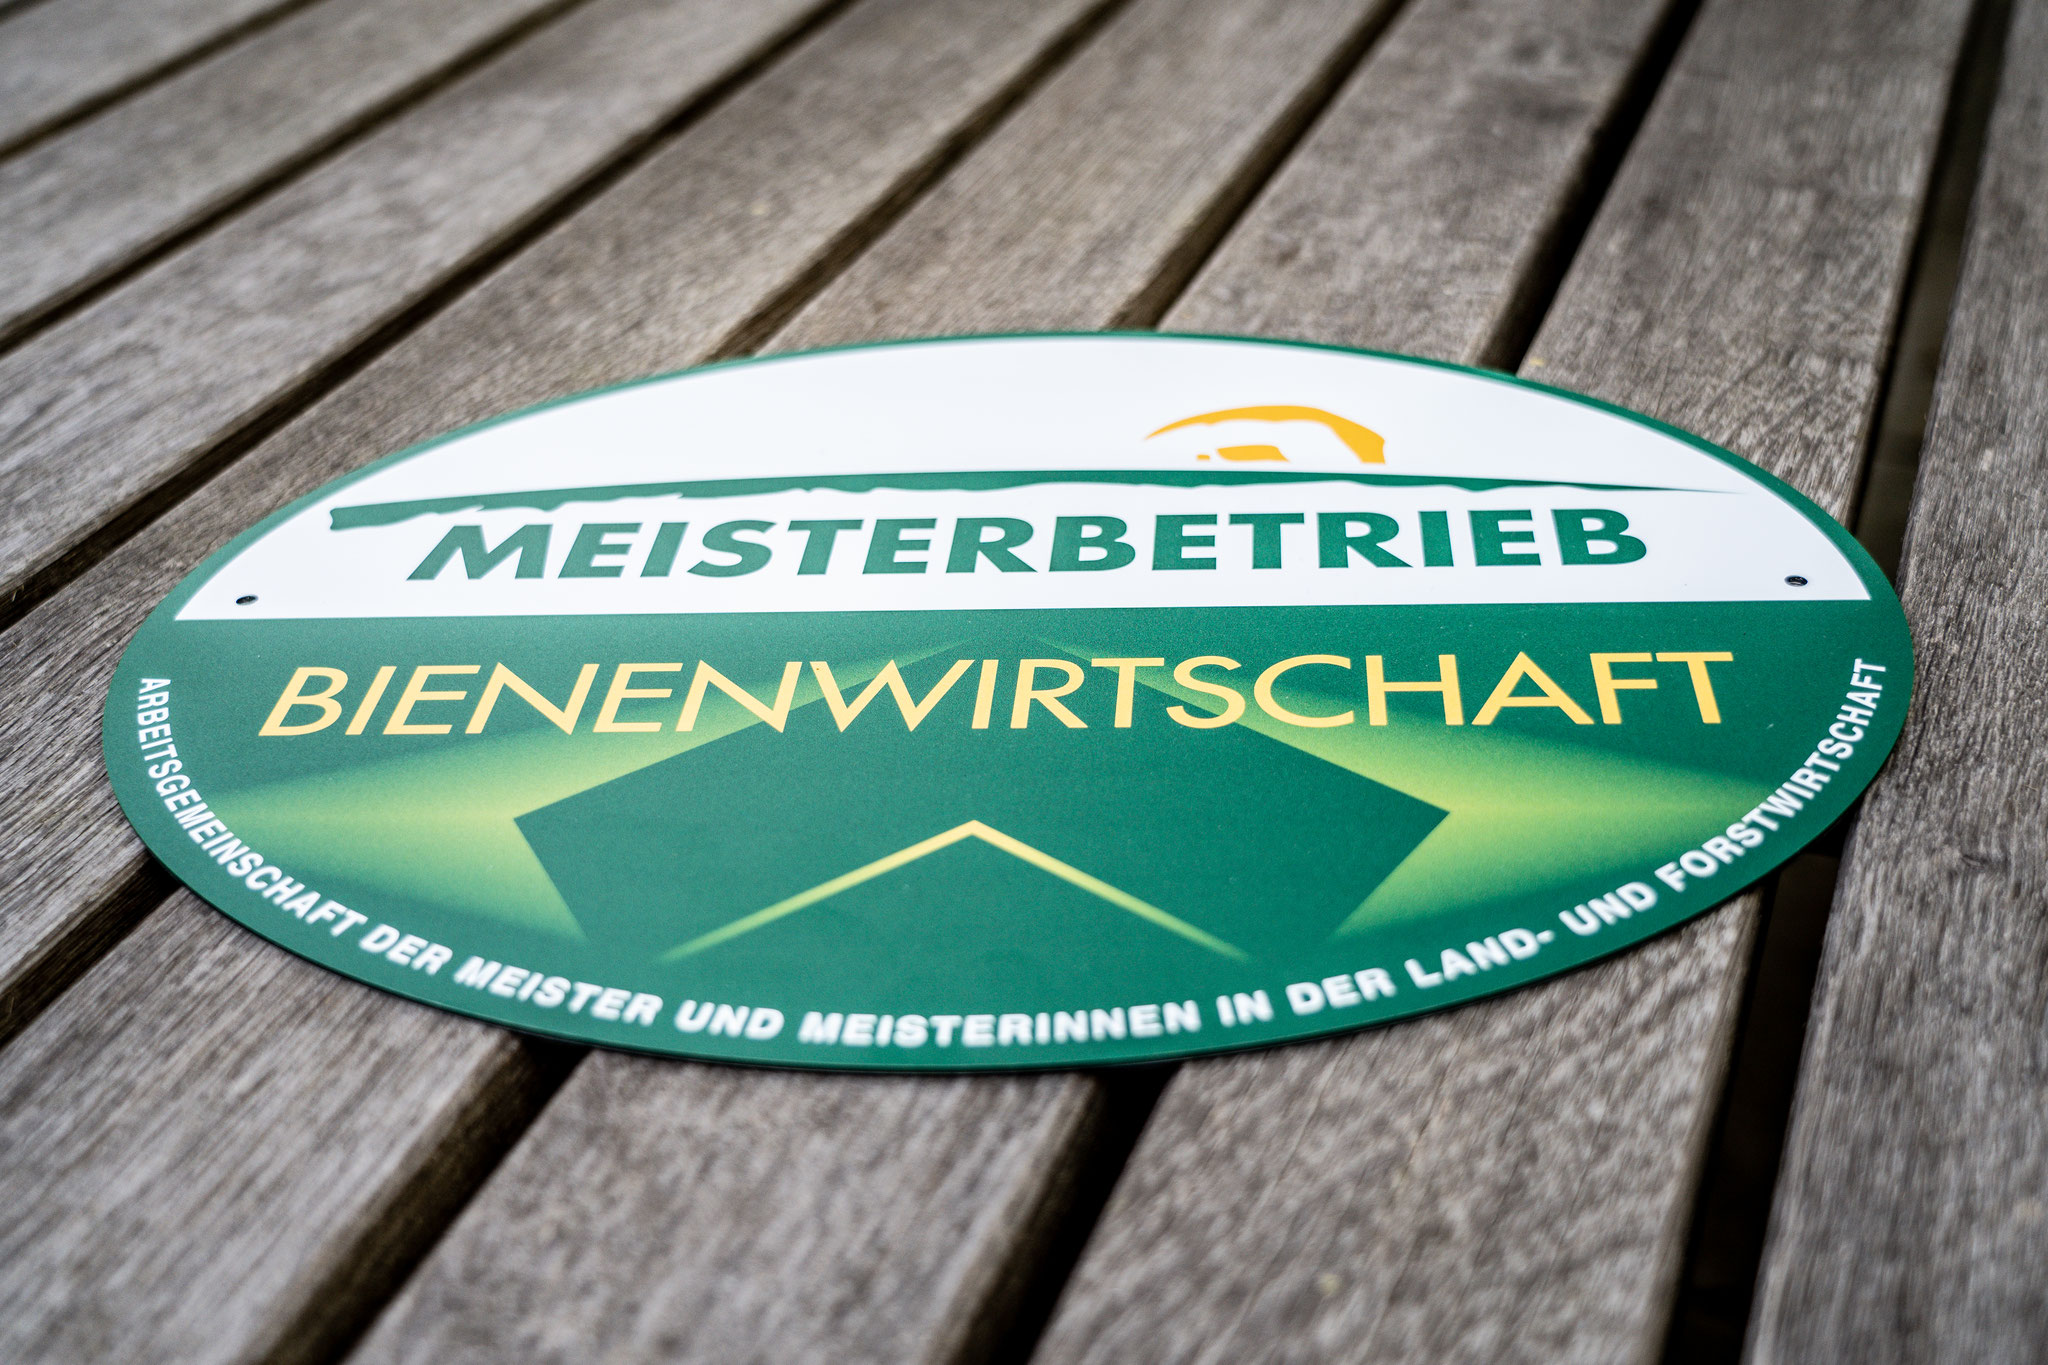 Meistertafel